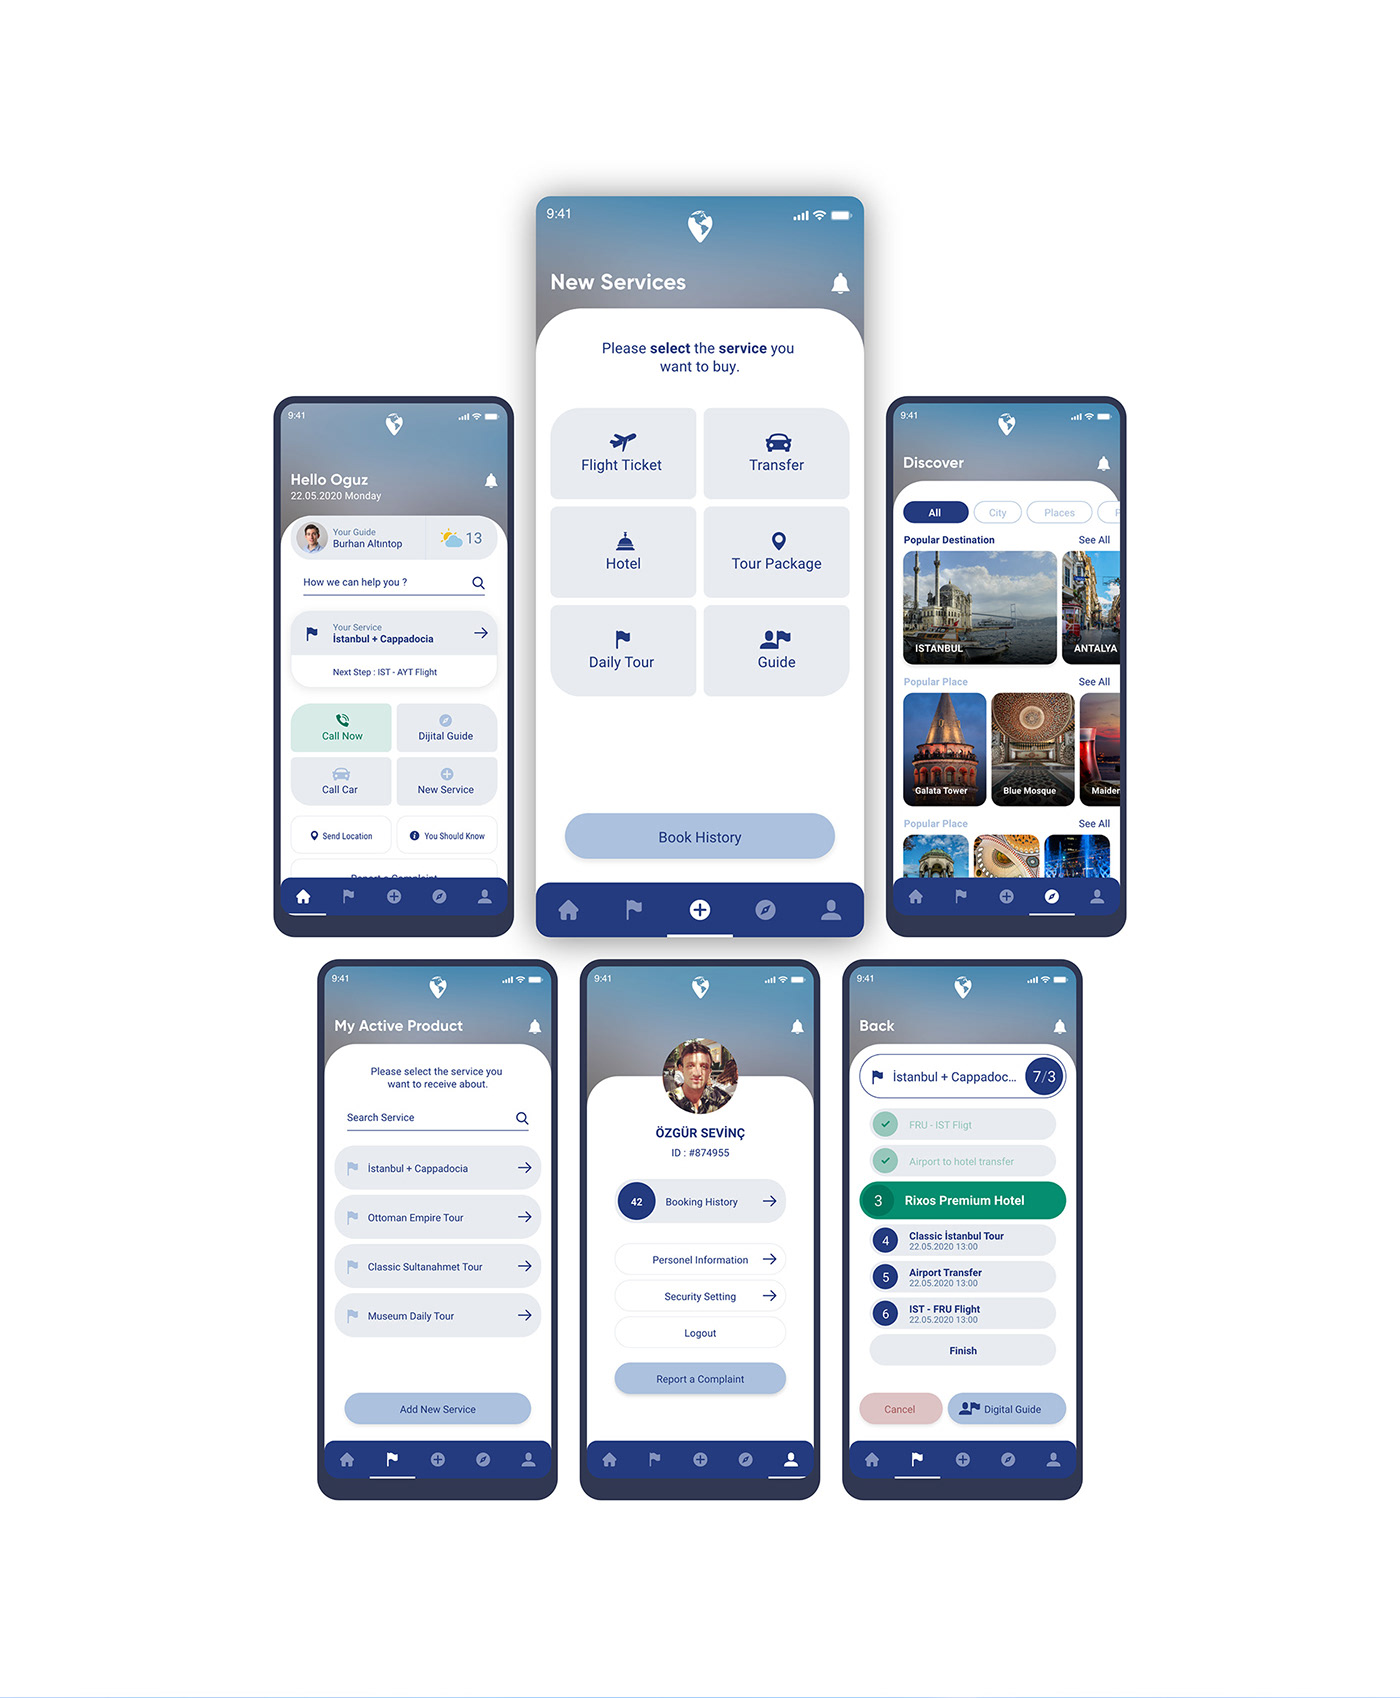 app,app design,design,Travel,turism,UI,user interface,ux,Uxer Experience,Web Design